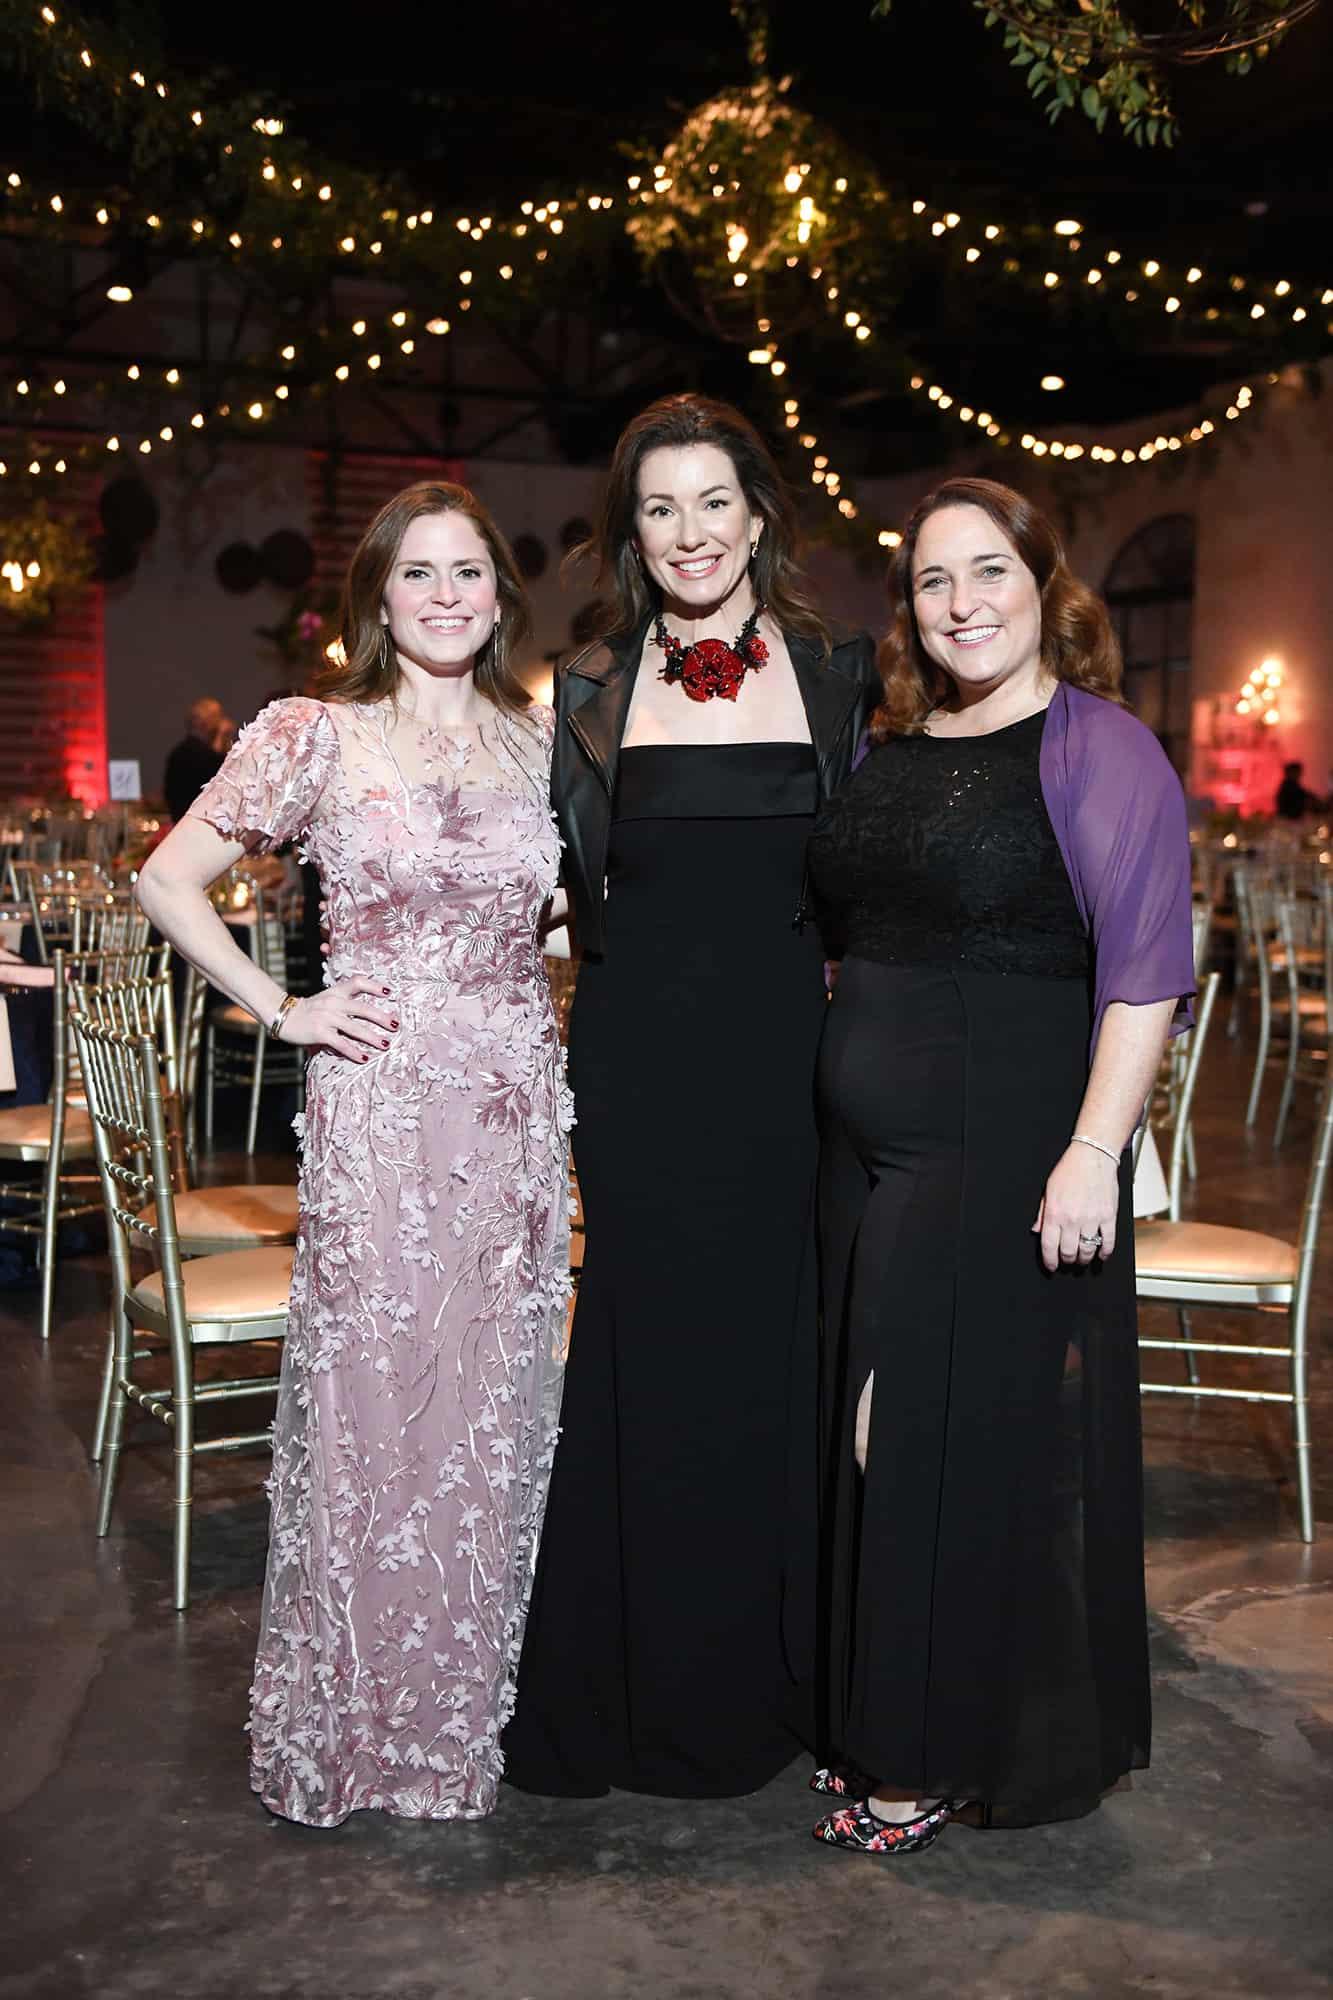 Lauren Granello, Alicia Gordy and Ruth Calabrese